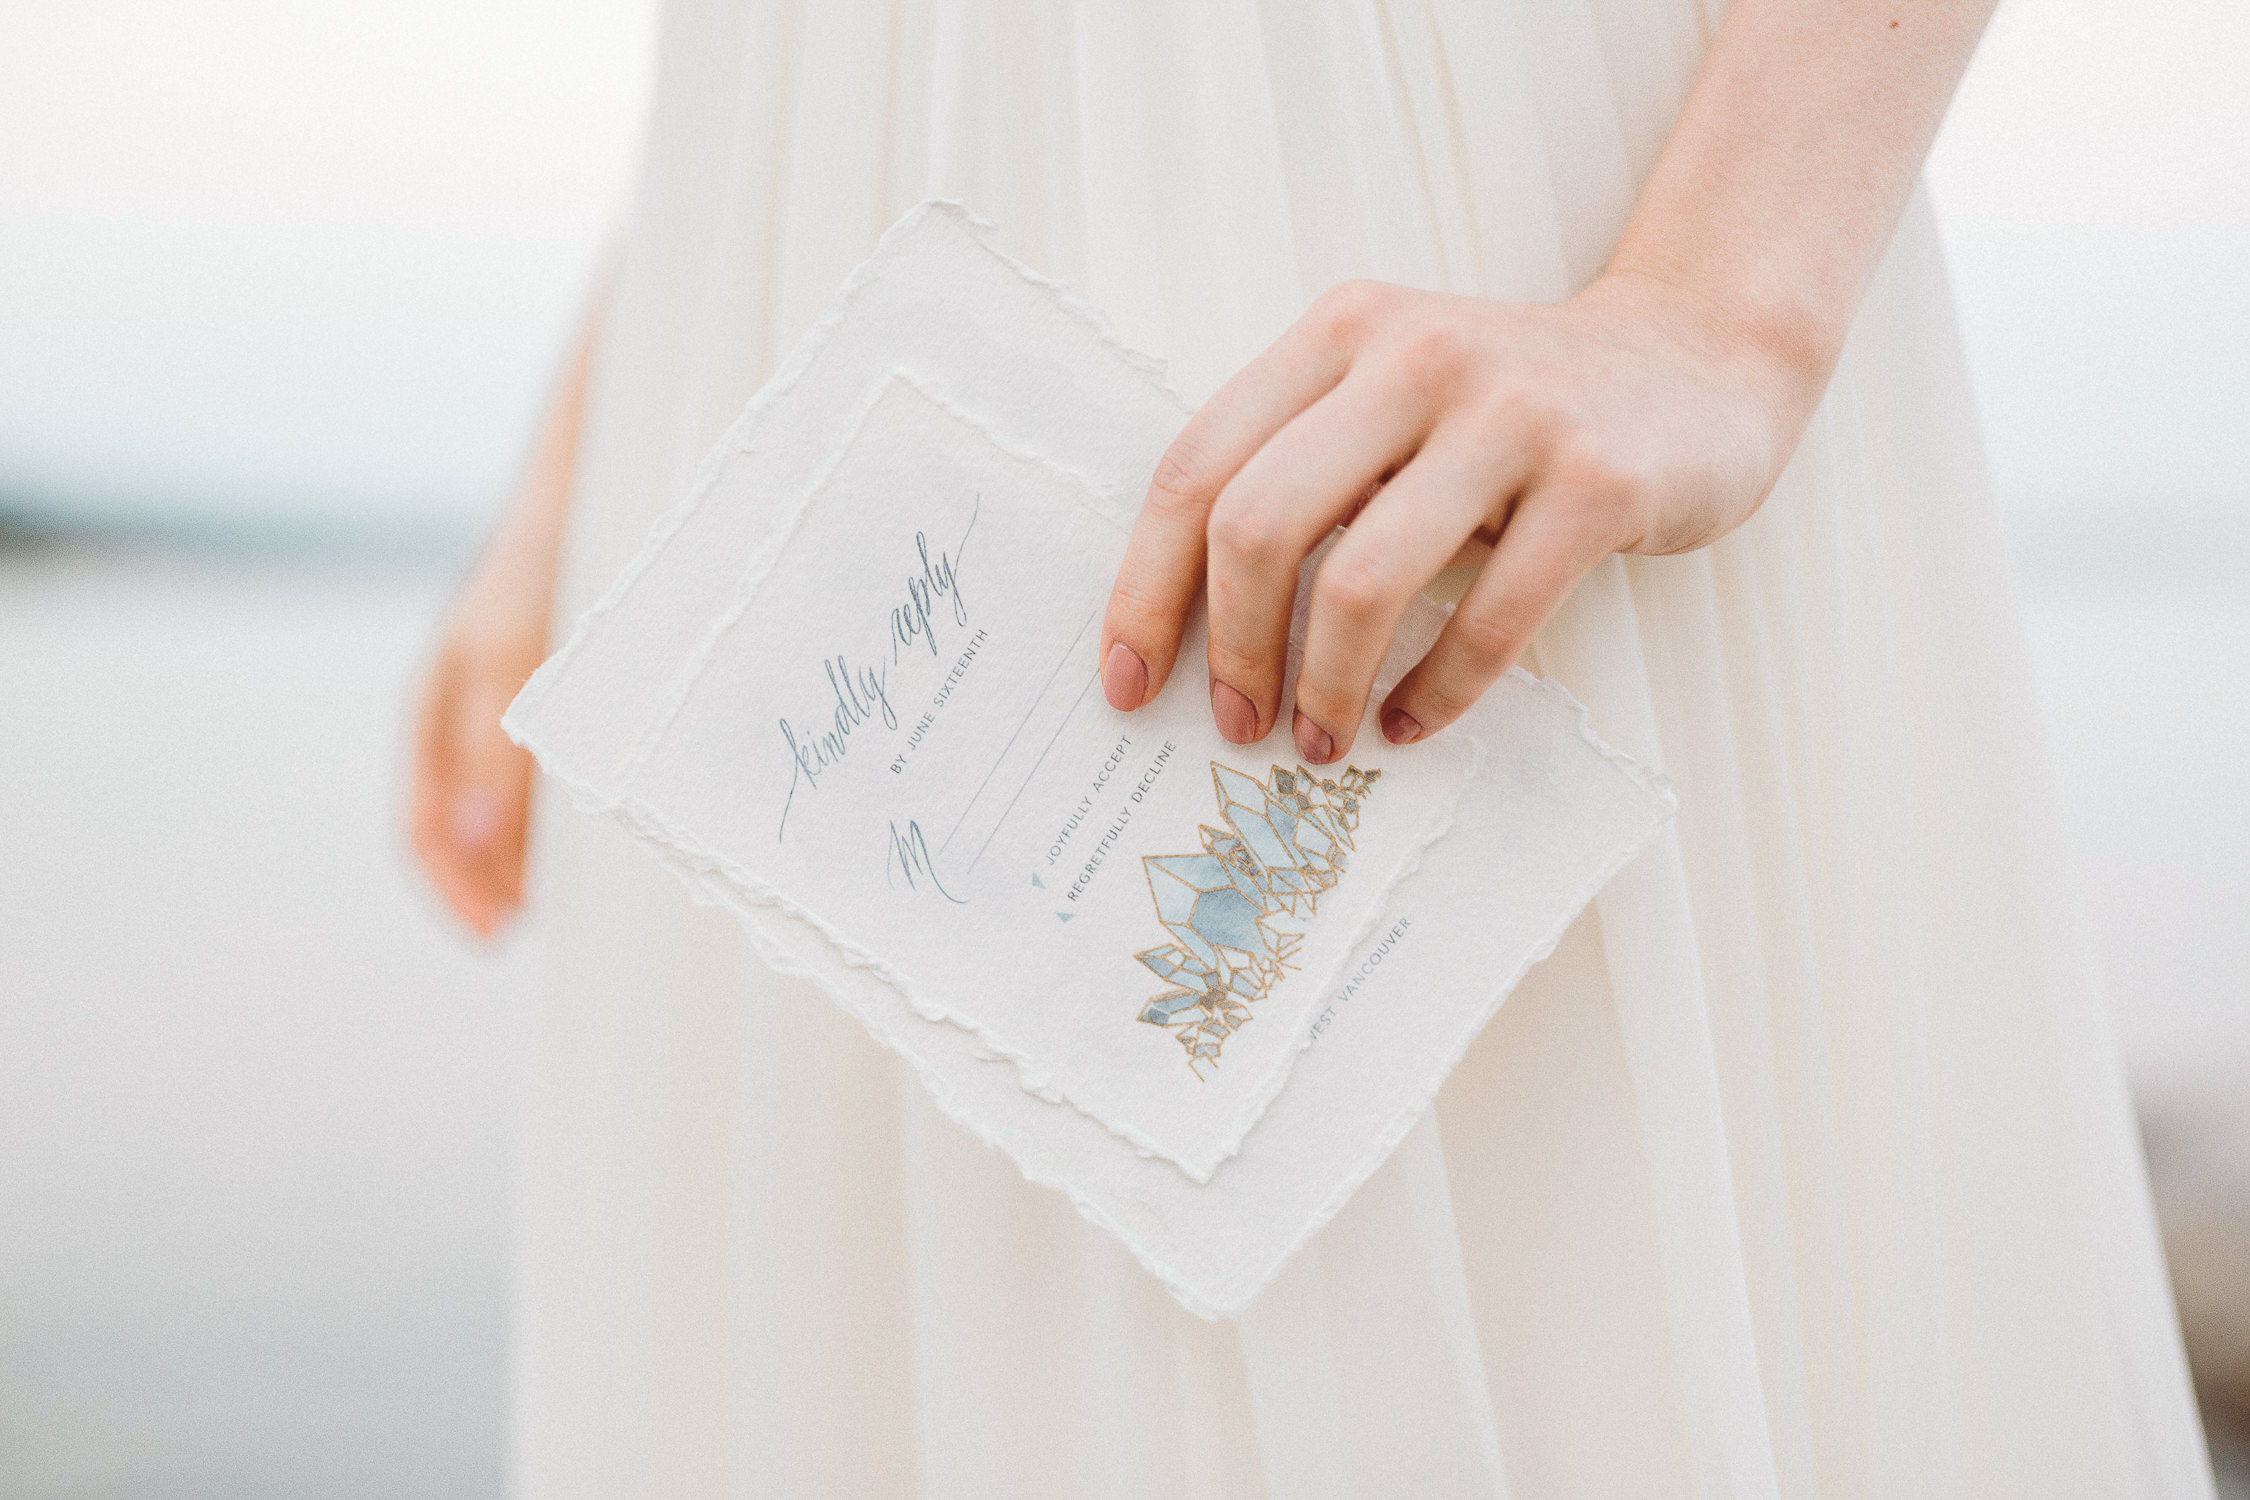 bespoke_wedding_invitation-10